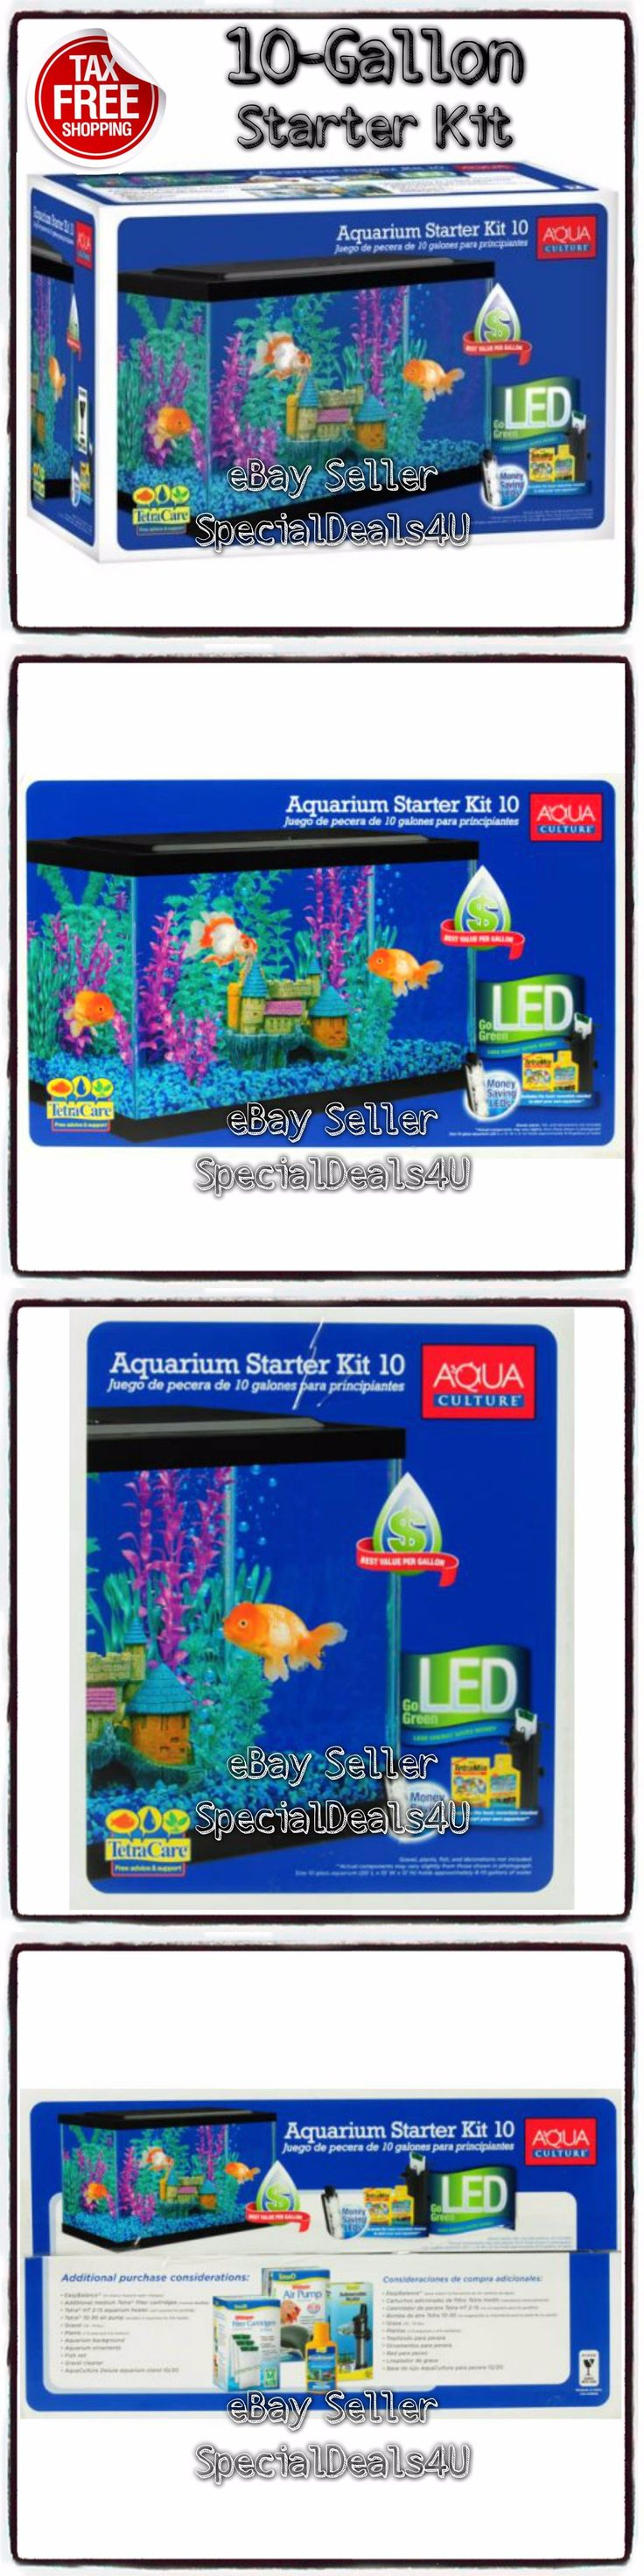 Bl system how many fish in a 55 aquaponics tank info - Aquariums And Tanks 20755 Aquarium Kit 10 Gallon Fish Tank Led Light Hood Filter Clear